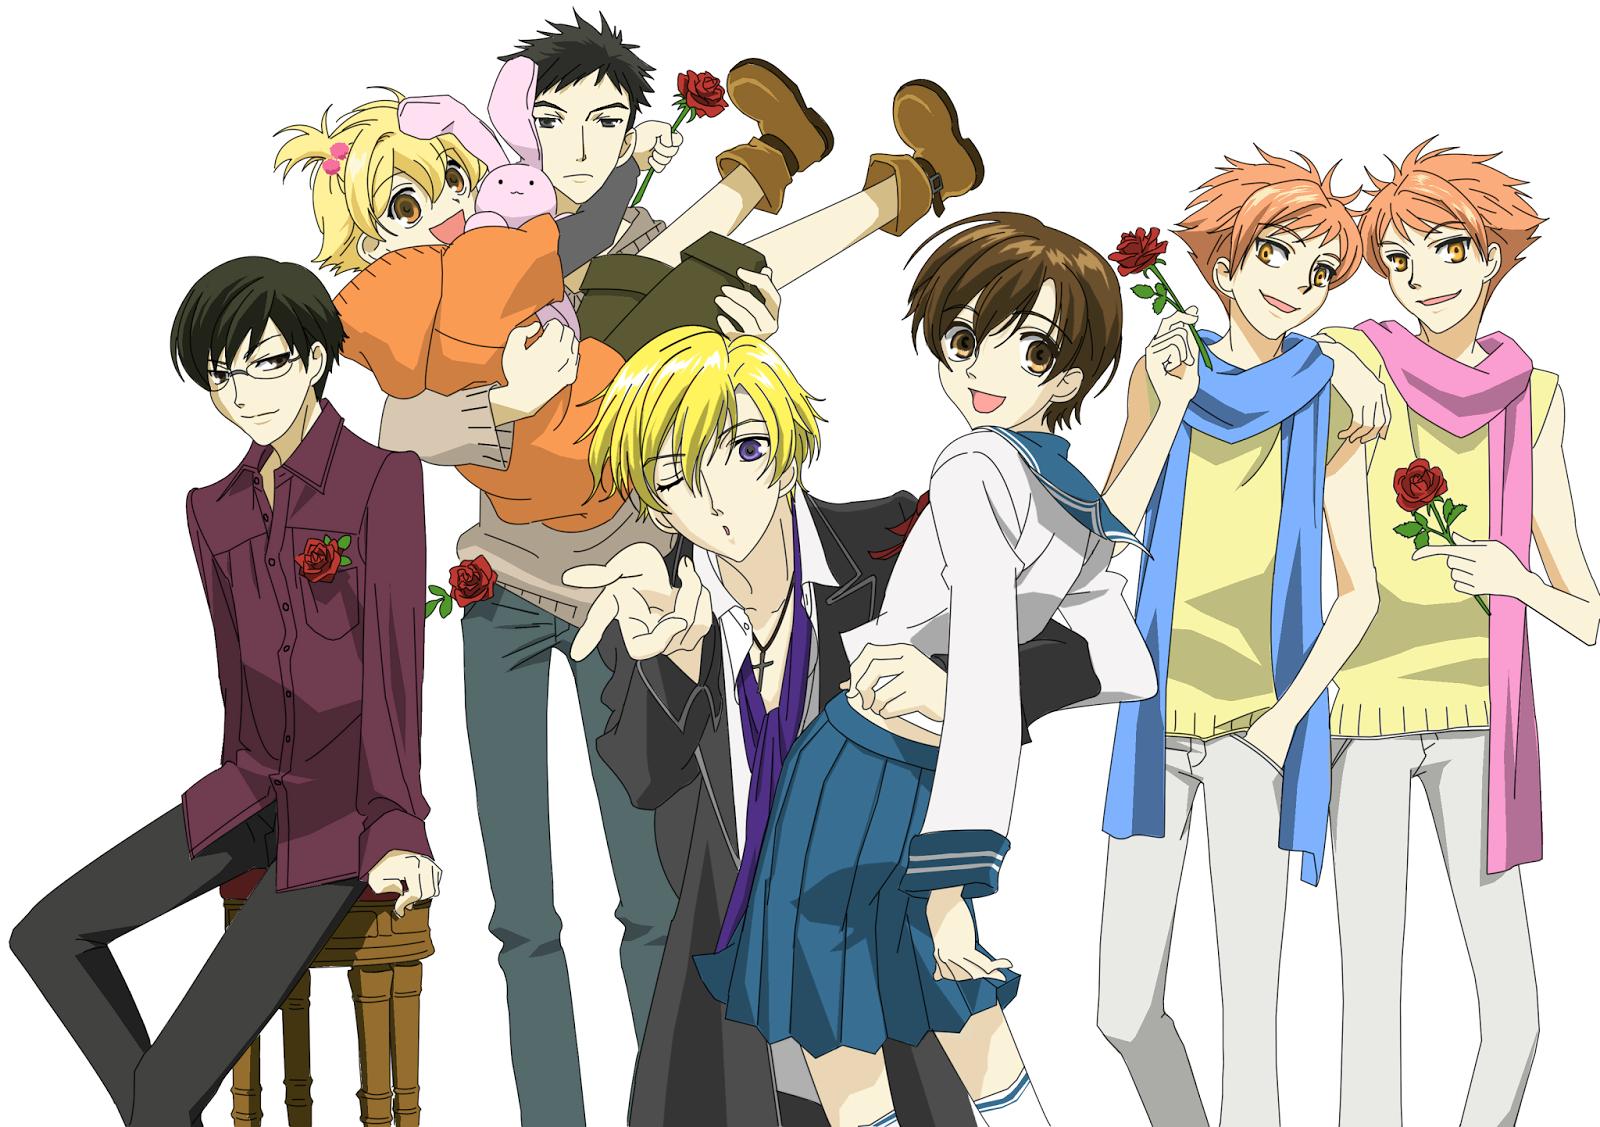 anime dp boys for whatsapp. Think Small. Dream Big.: BEST LOVE TRIANGLES IN ANIME/MANGA